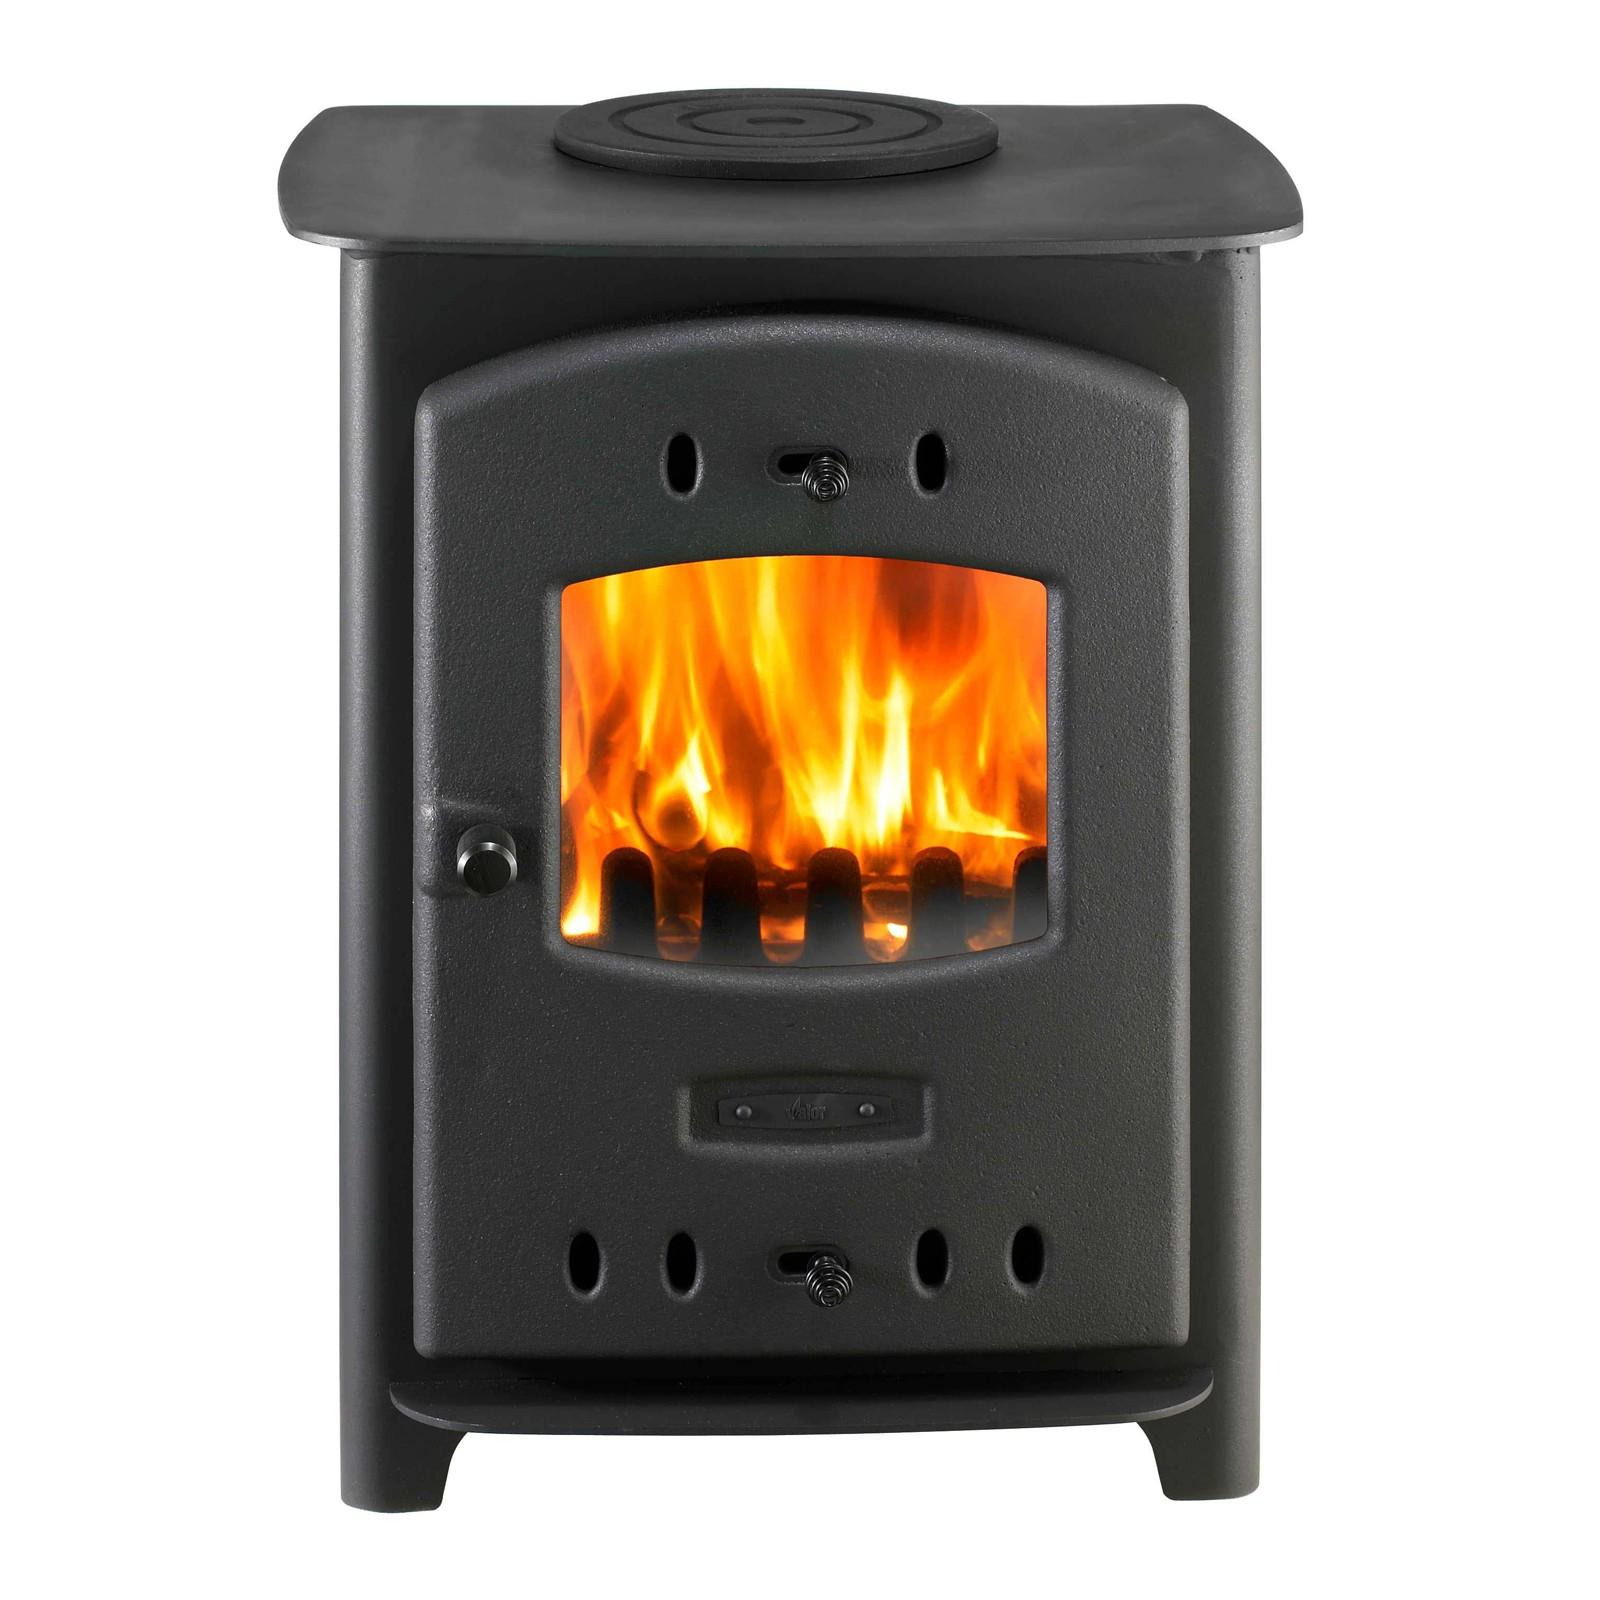 perfect stove valor willow multi fuel stove bargain price. Black Bedroom Furniture Sets. Home Design Ideas